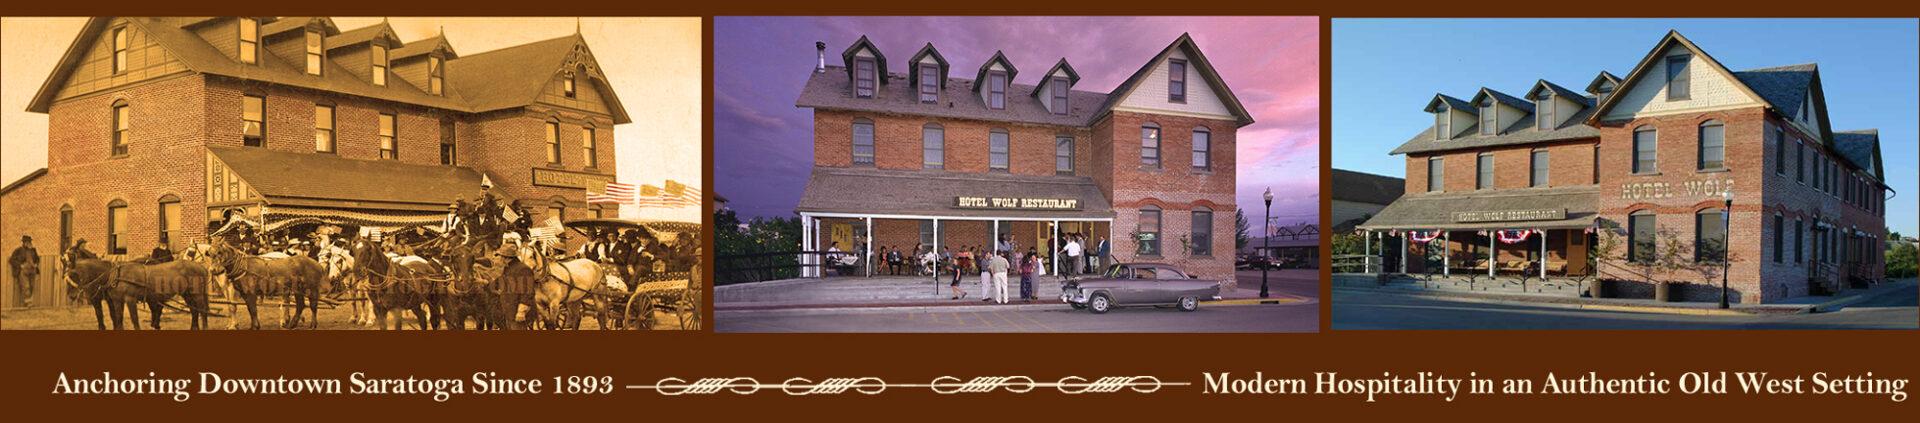 wolf-hotel-Saratoga